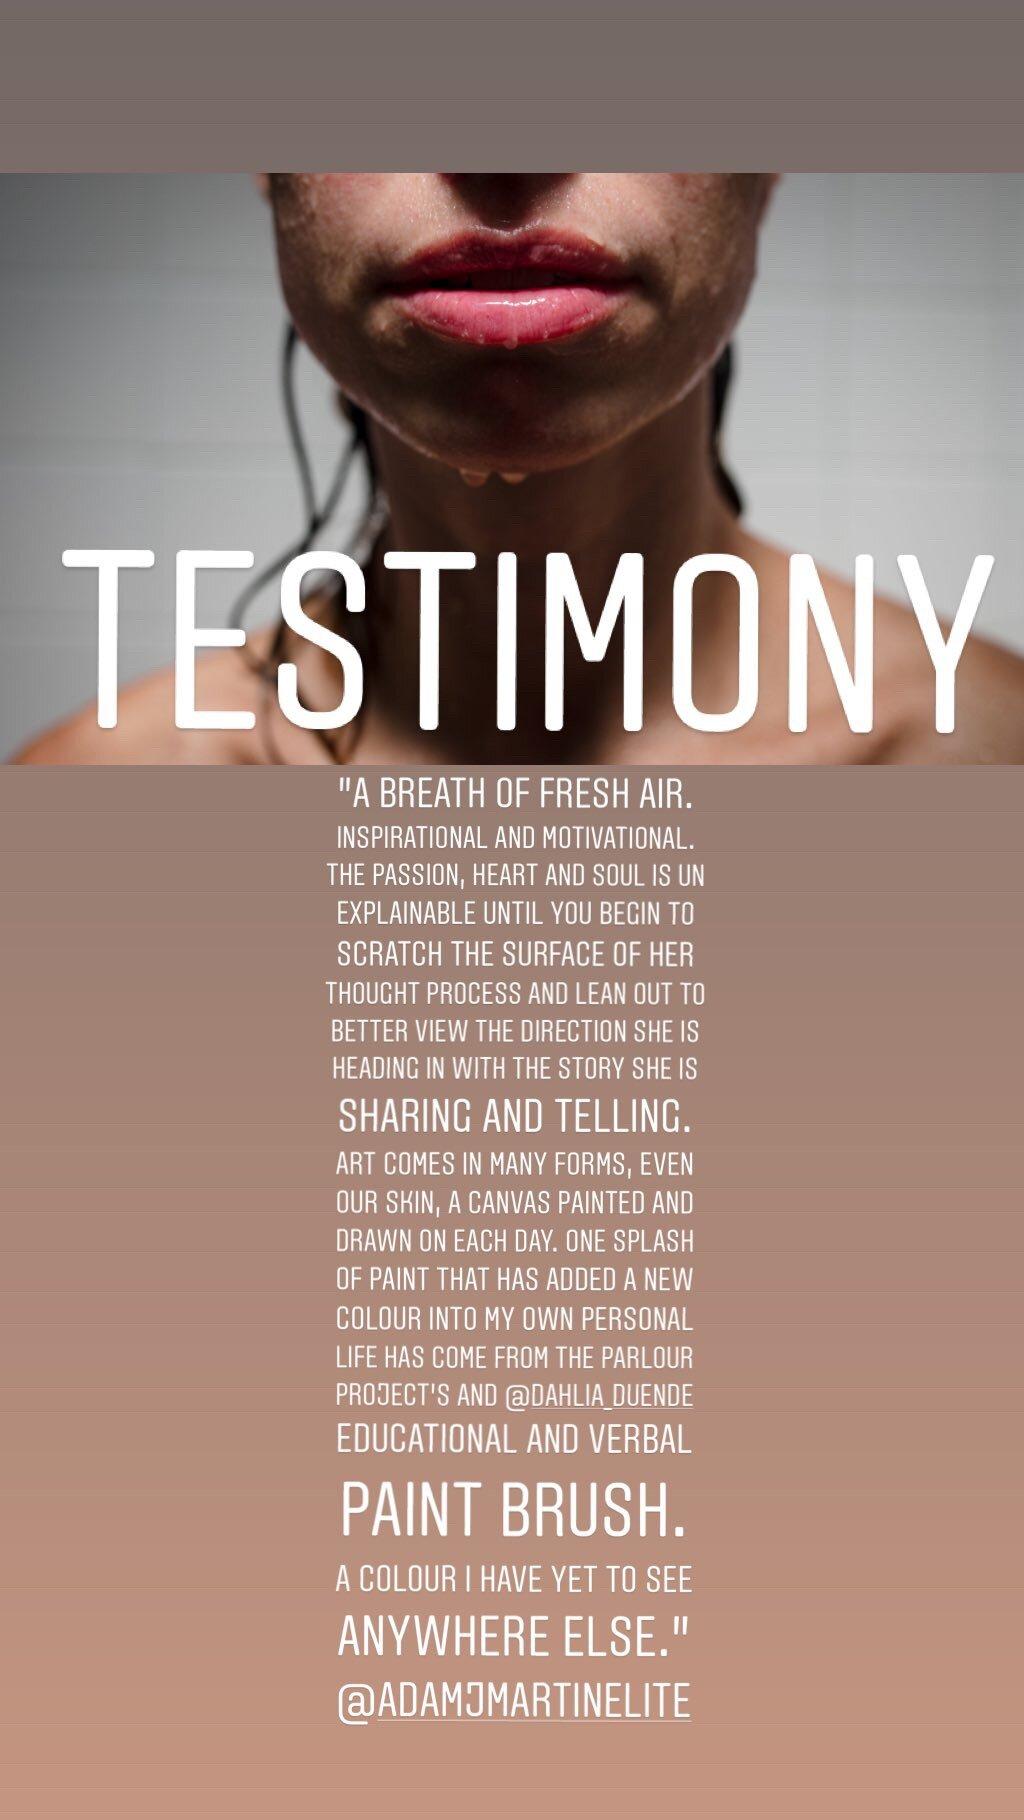 The Parlour Project Testimonial 09:03.jpg